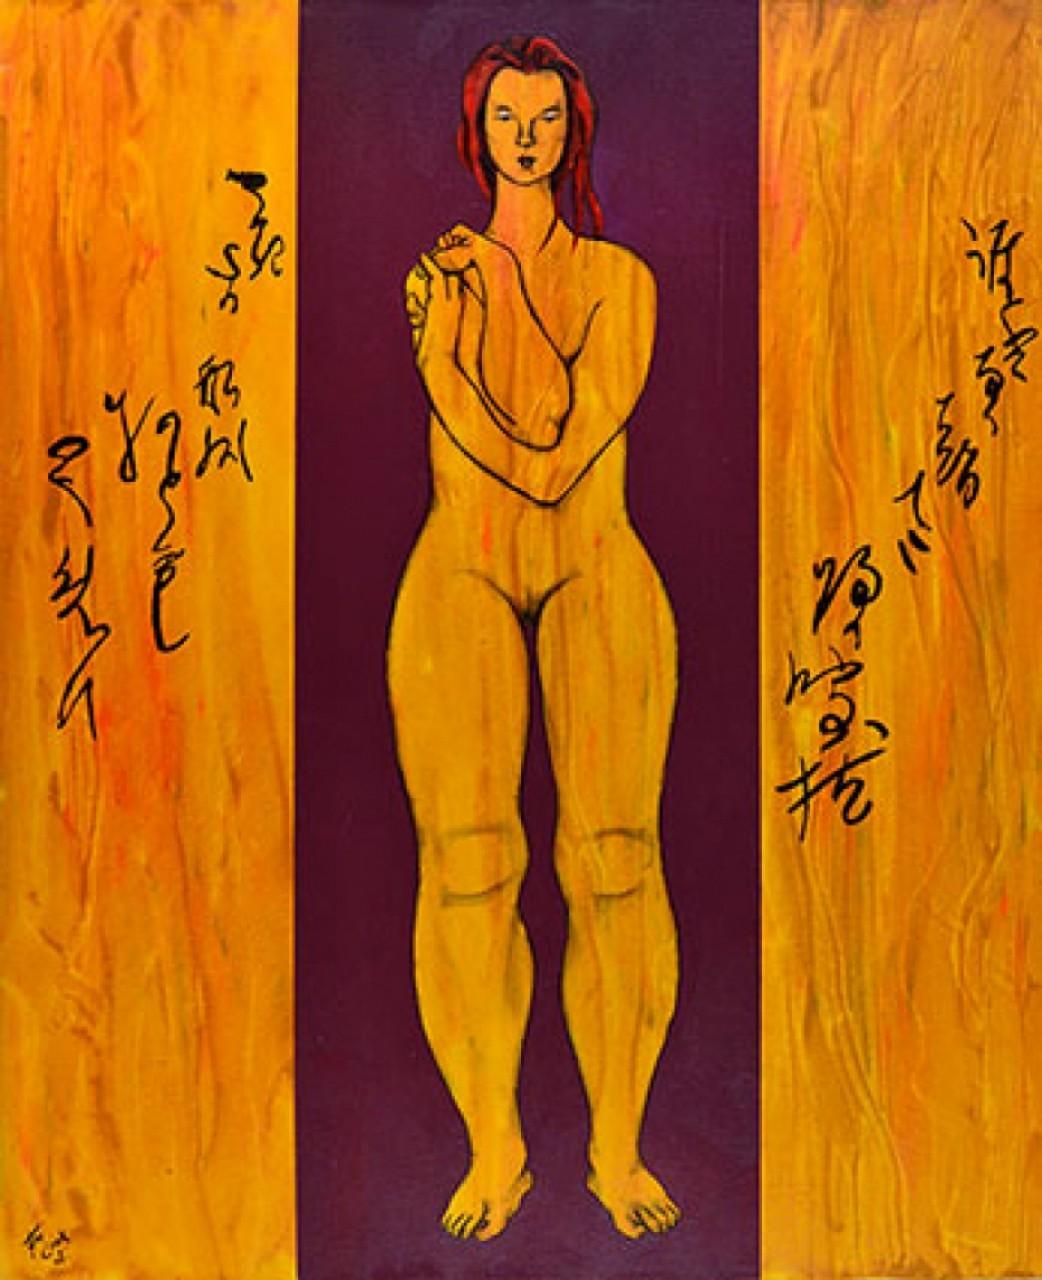 COOK Juan femme nue asiatique